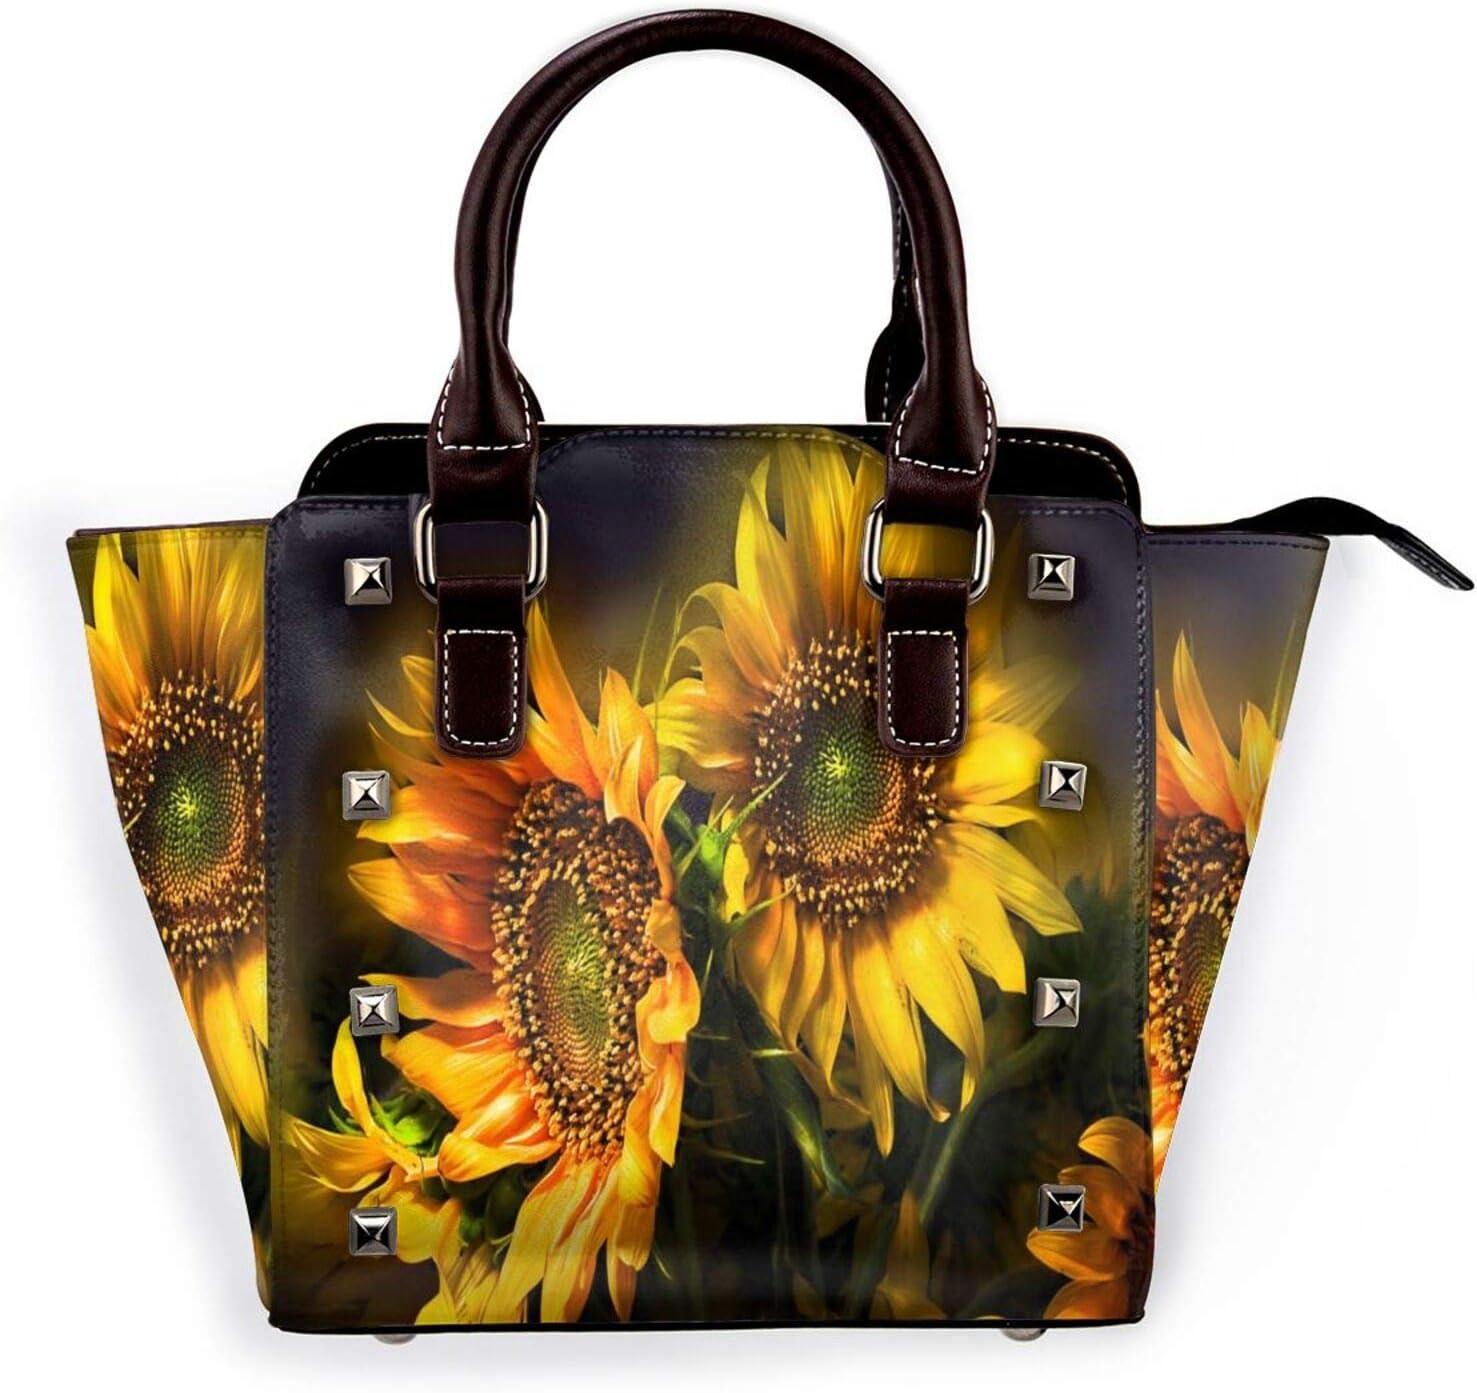 Tote Bag Deluxe Sunflowers Bouquets Waterproof Han Low price Durable Shoulder